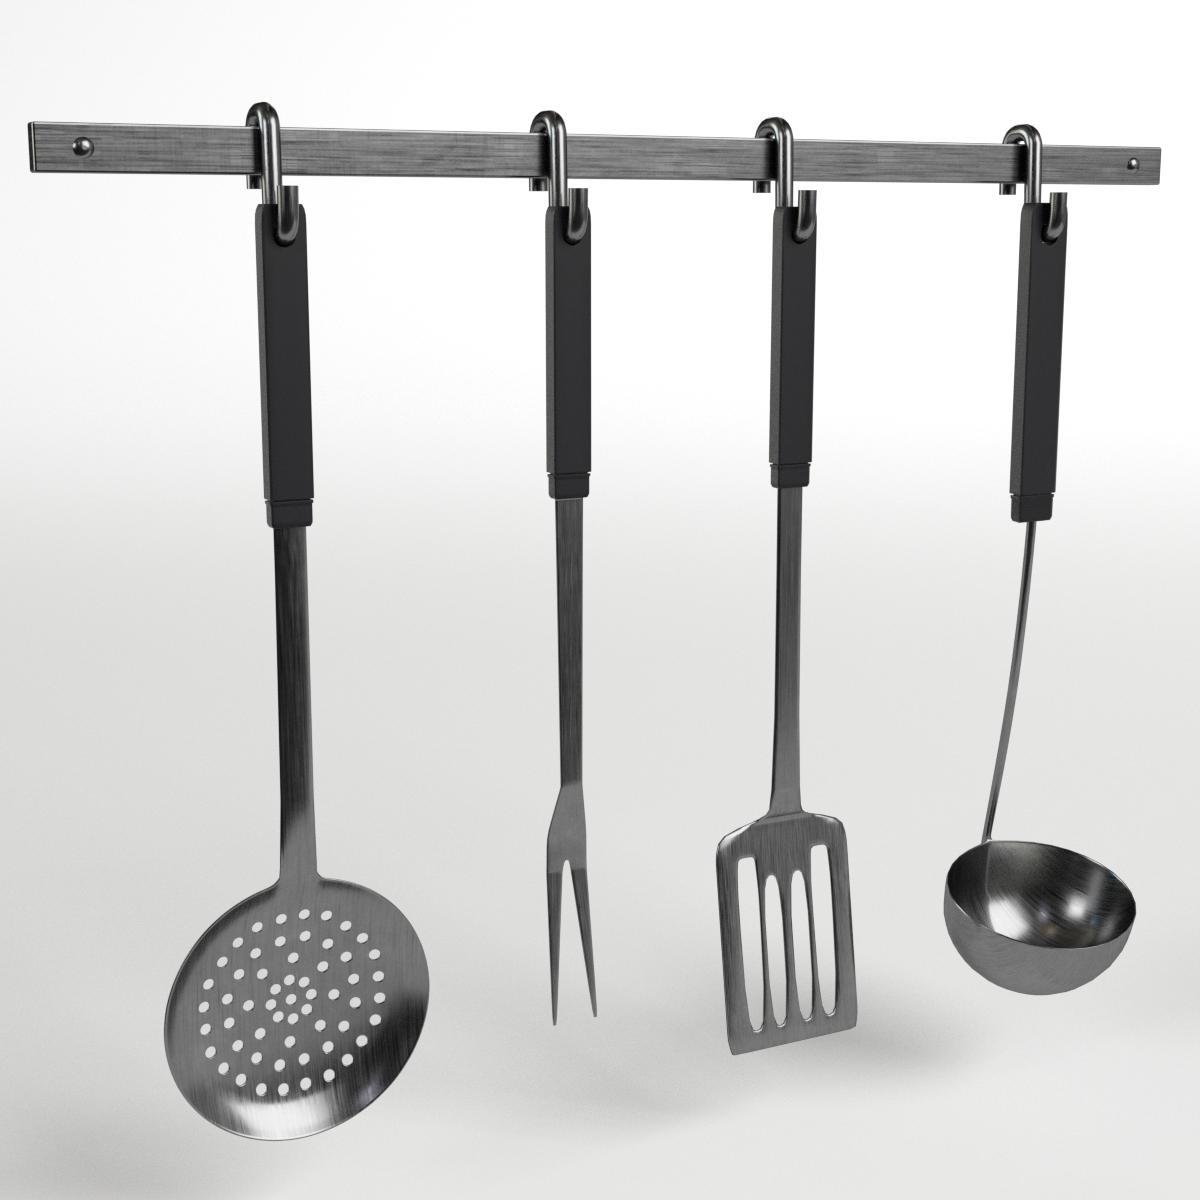 kitchen tools utensils rack by francescomilanese  docean - imagesetkitchentoolsutensilsrack